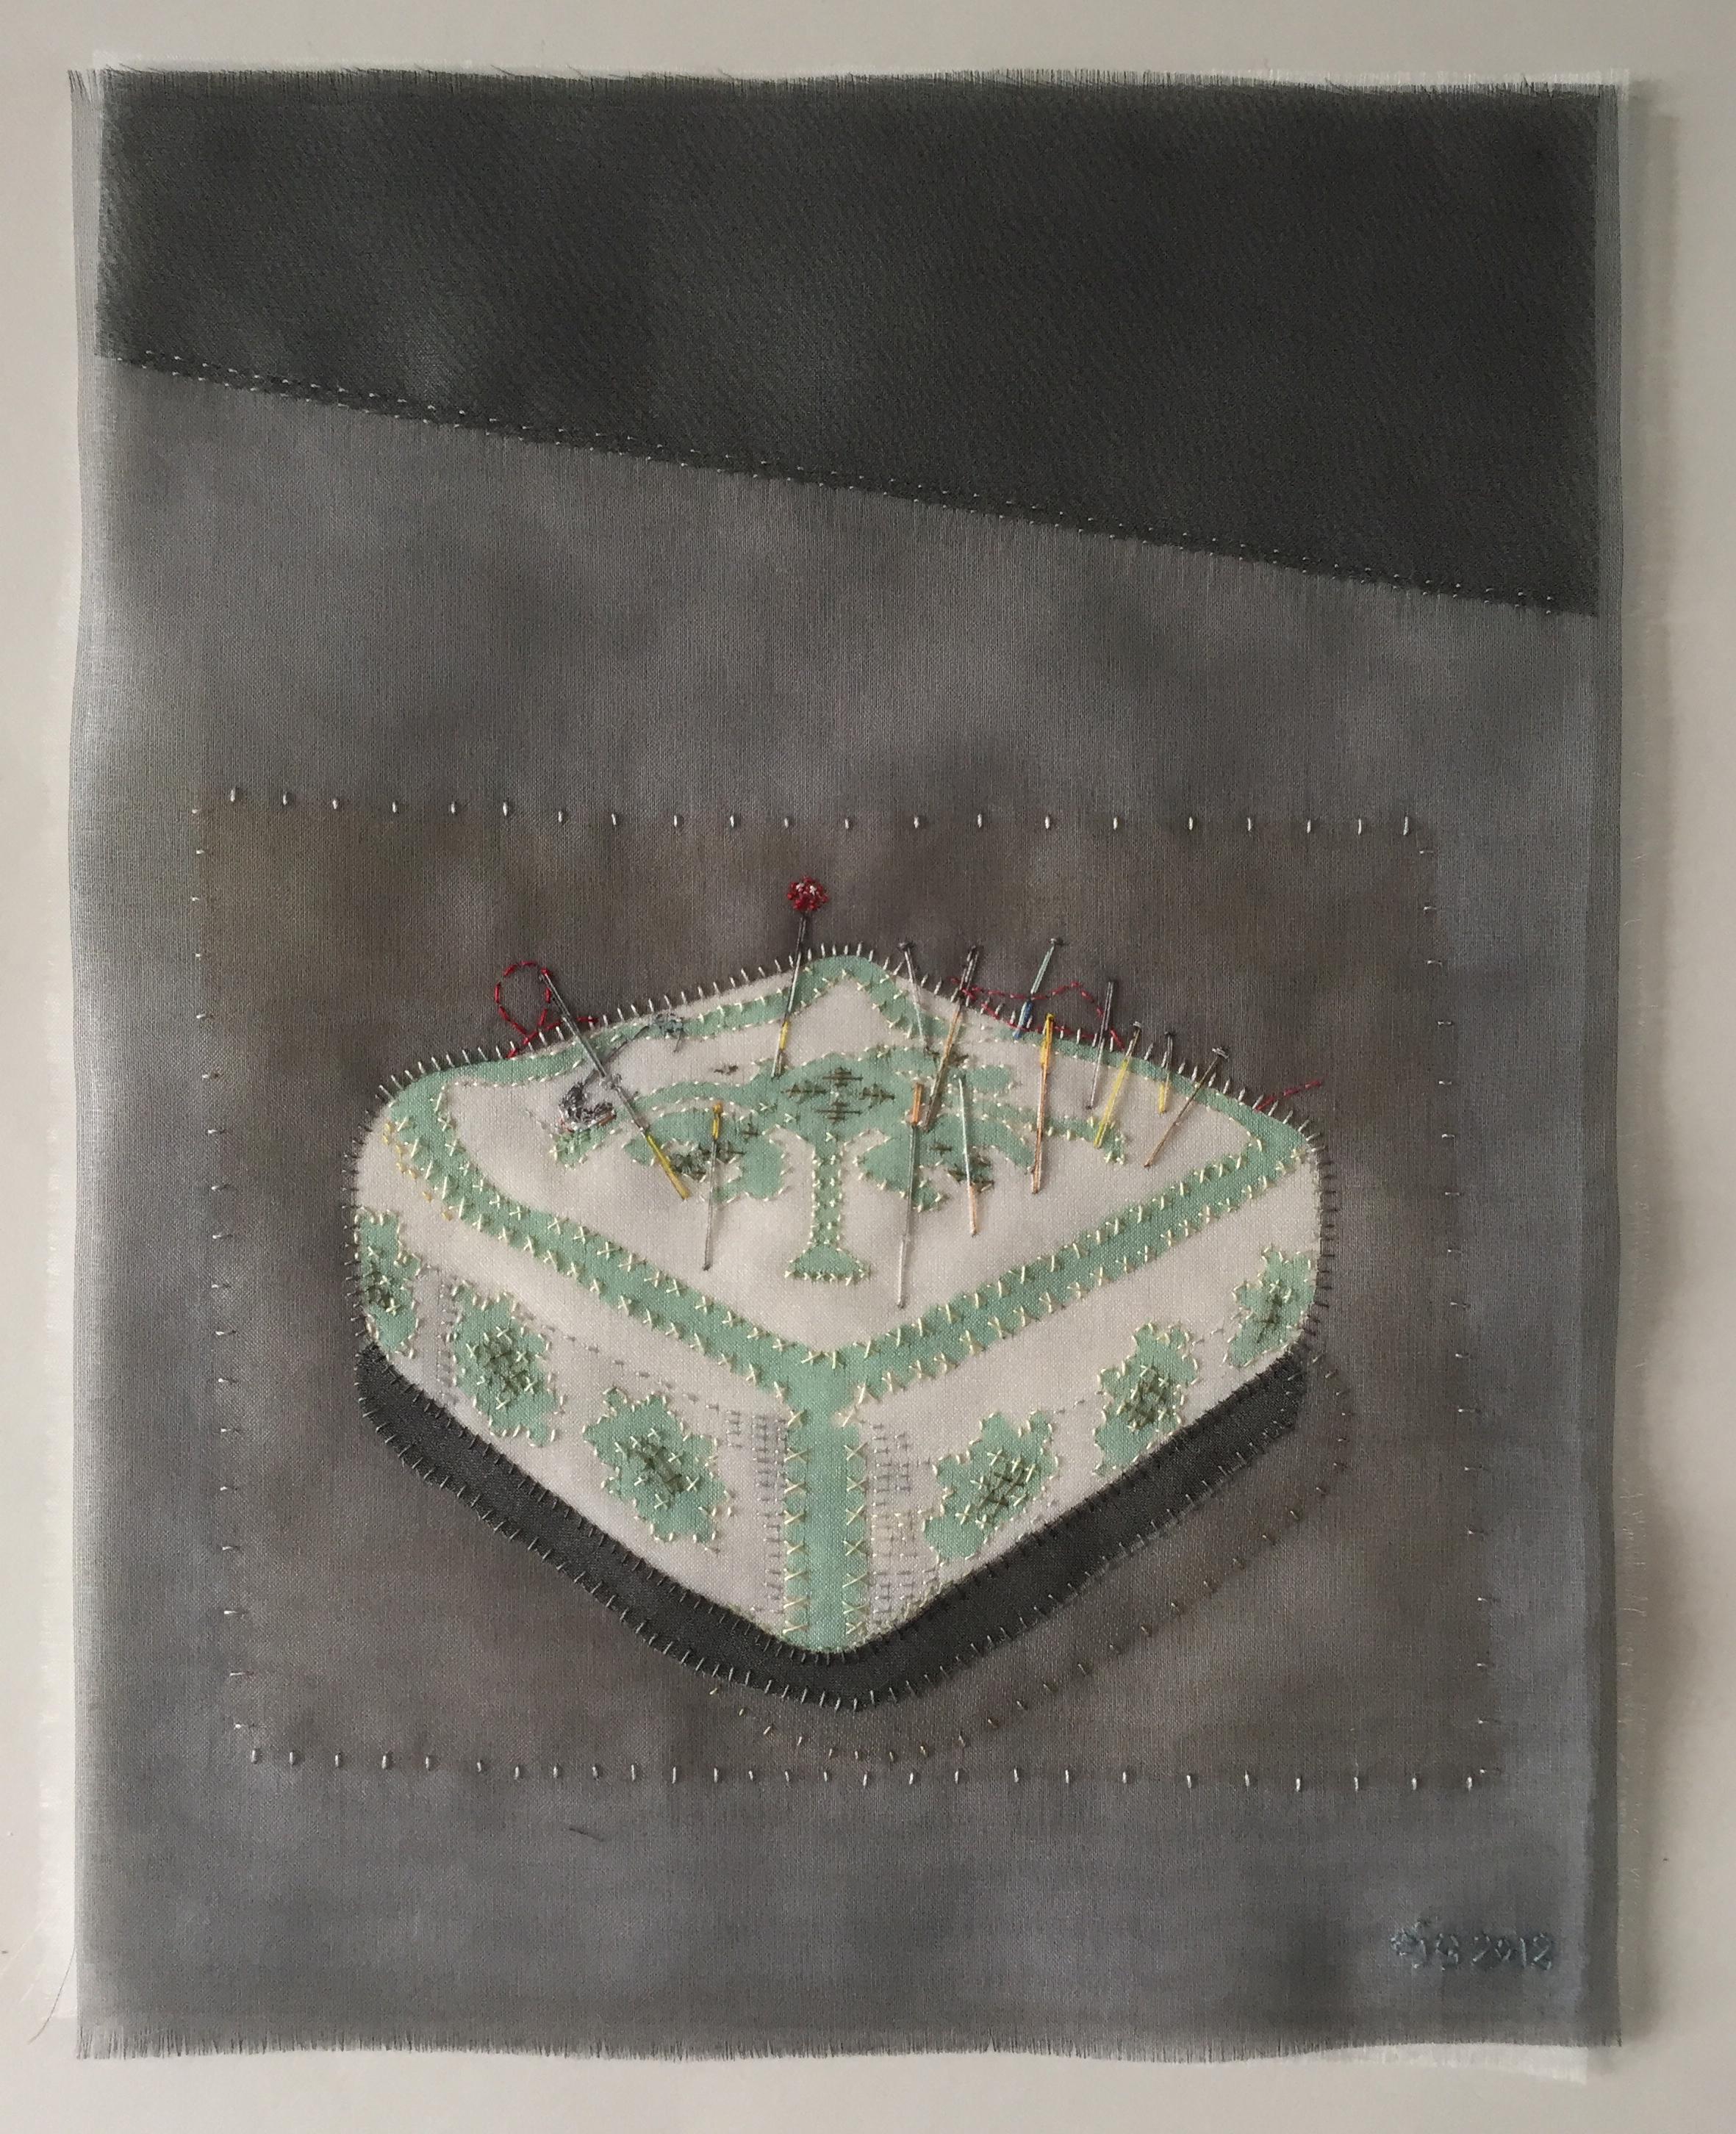 Green pincushion - Silk organza applique on linen, hand stitched £1300